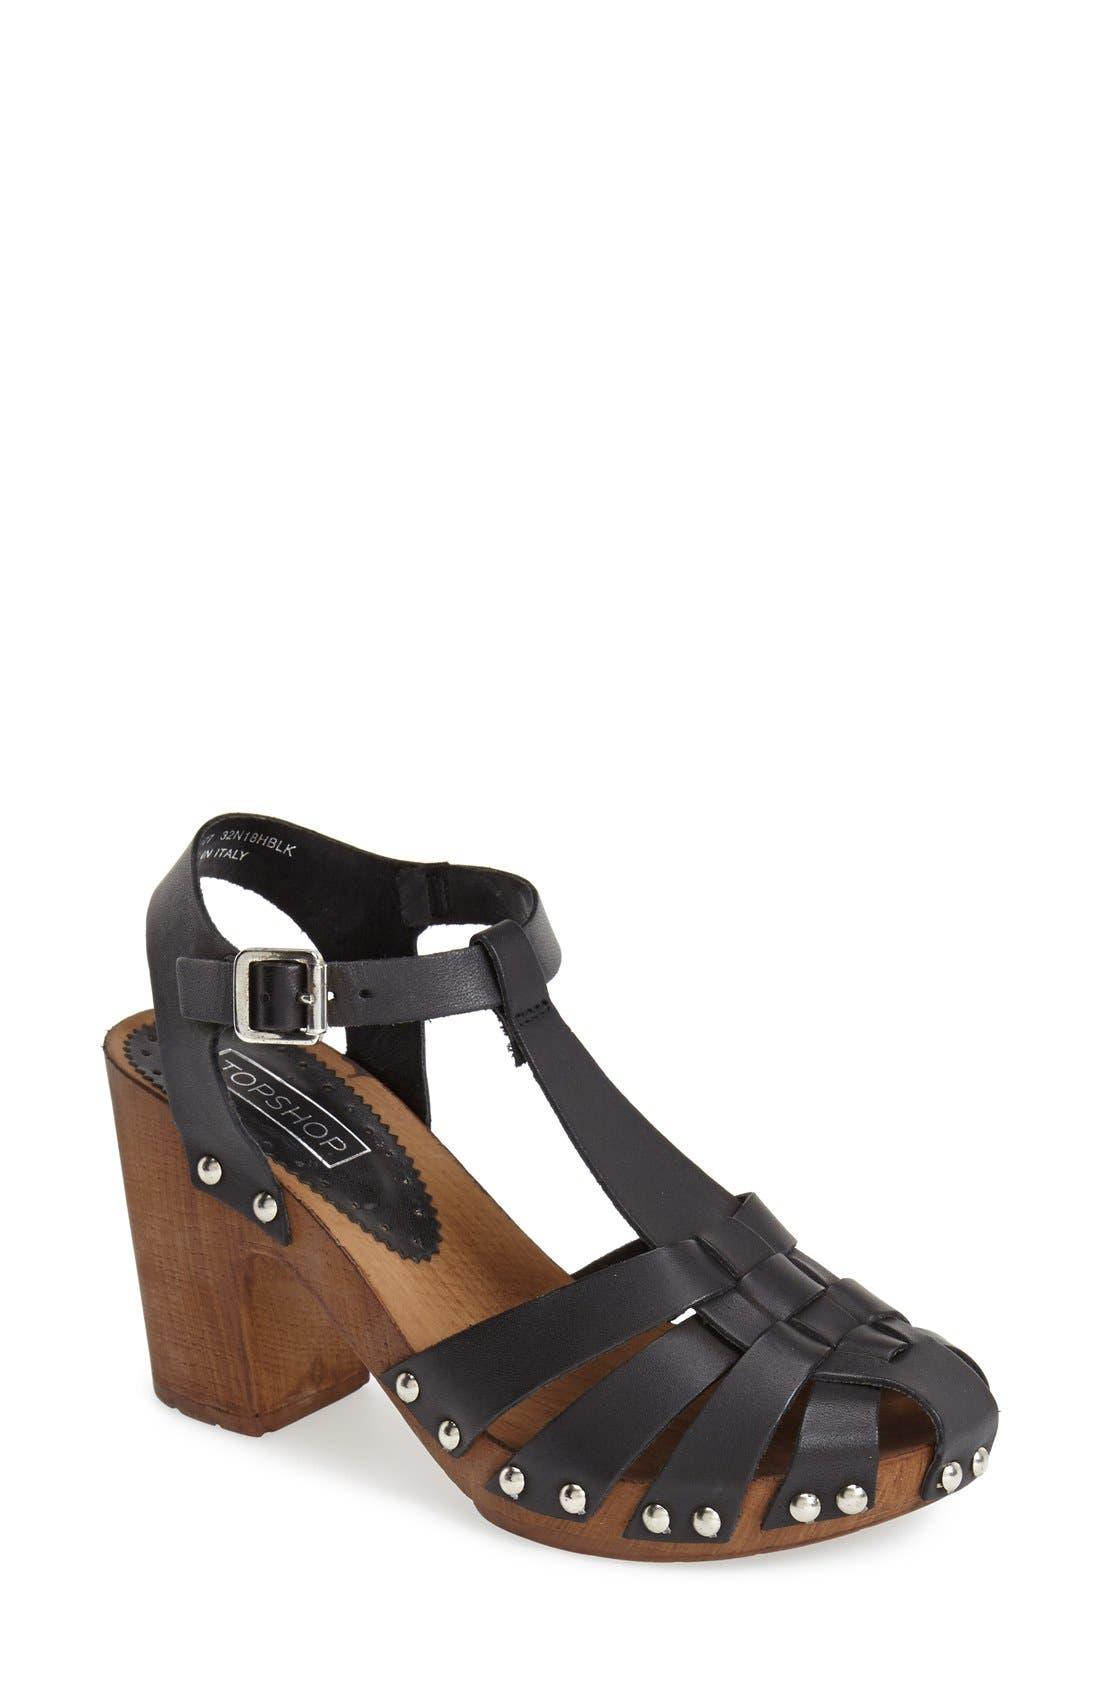 Alternate Image 1 Selected - Topshop 'Nelly' Leather Platform Sandal (Women)